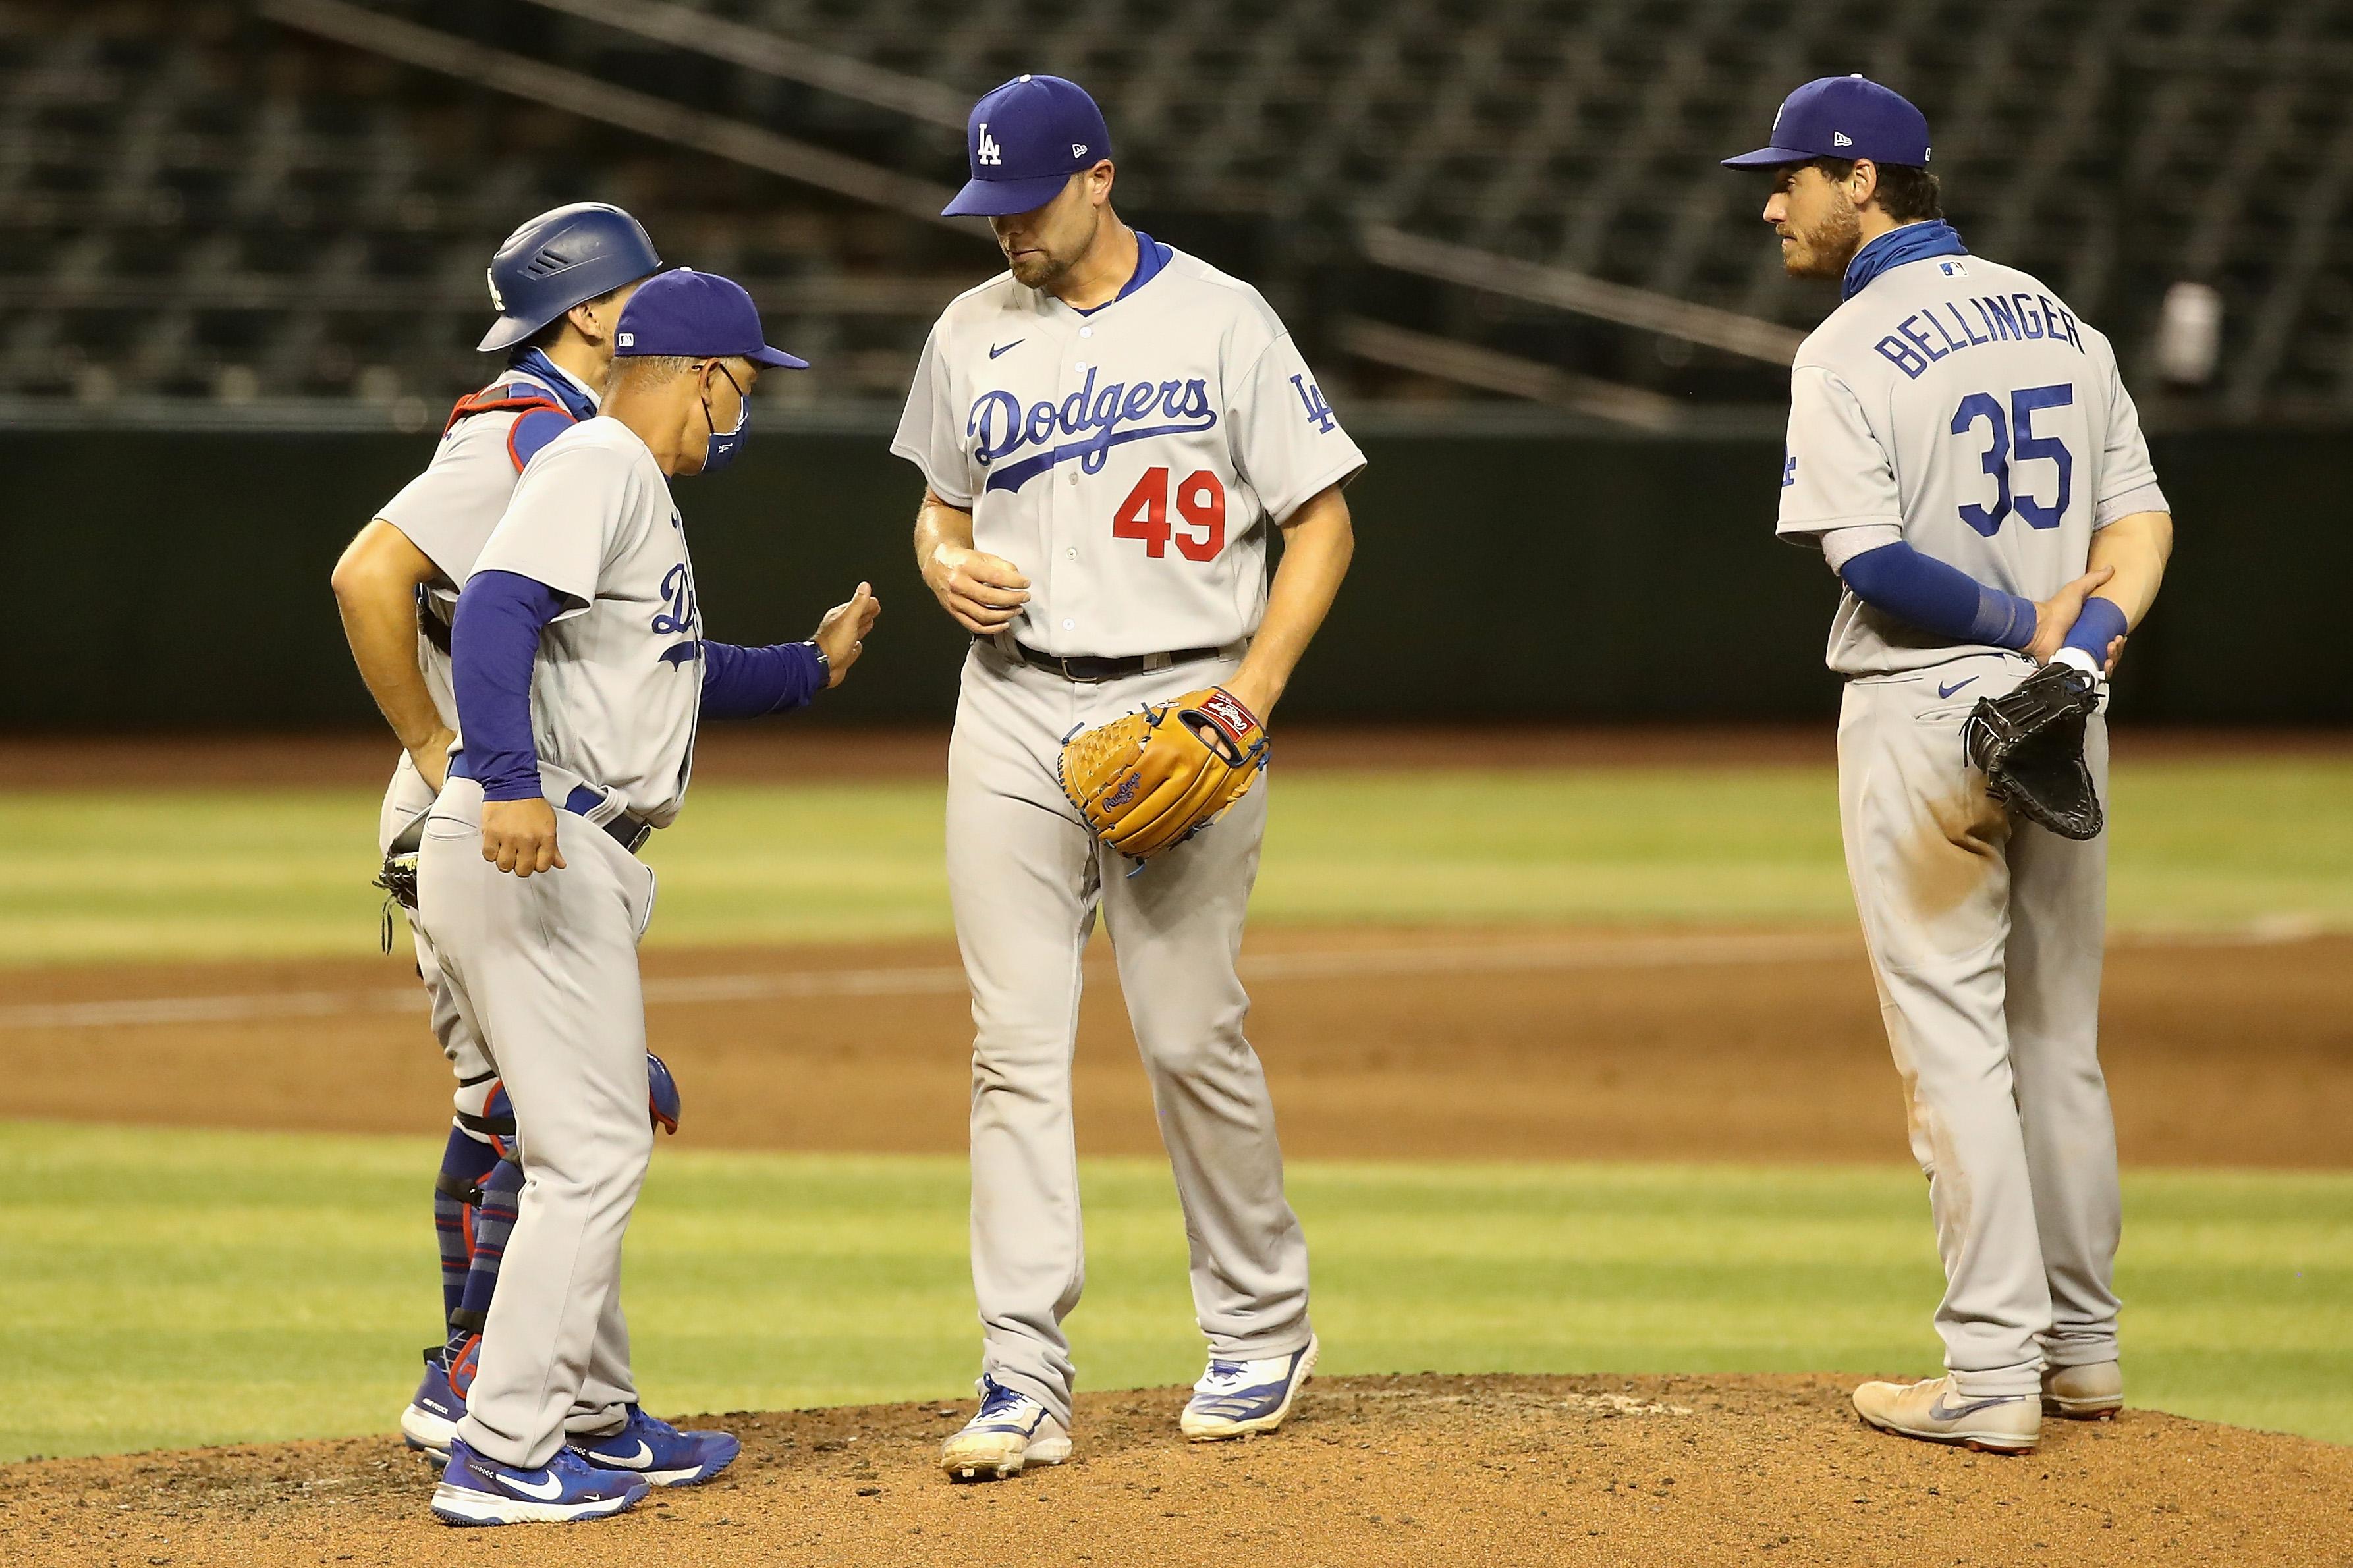 Christian Walker's Double in 8th Lifts Diamondbacks Over Dodgers, 5-3